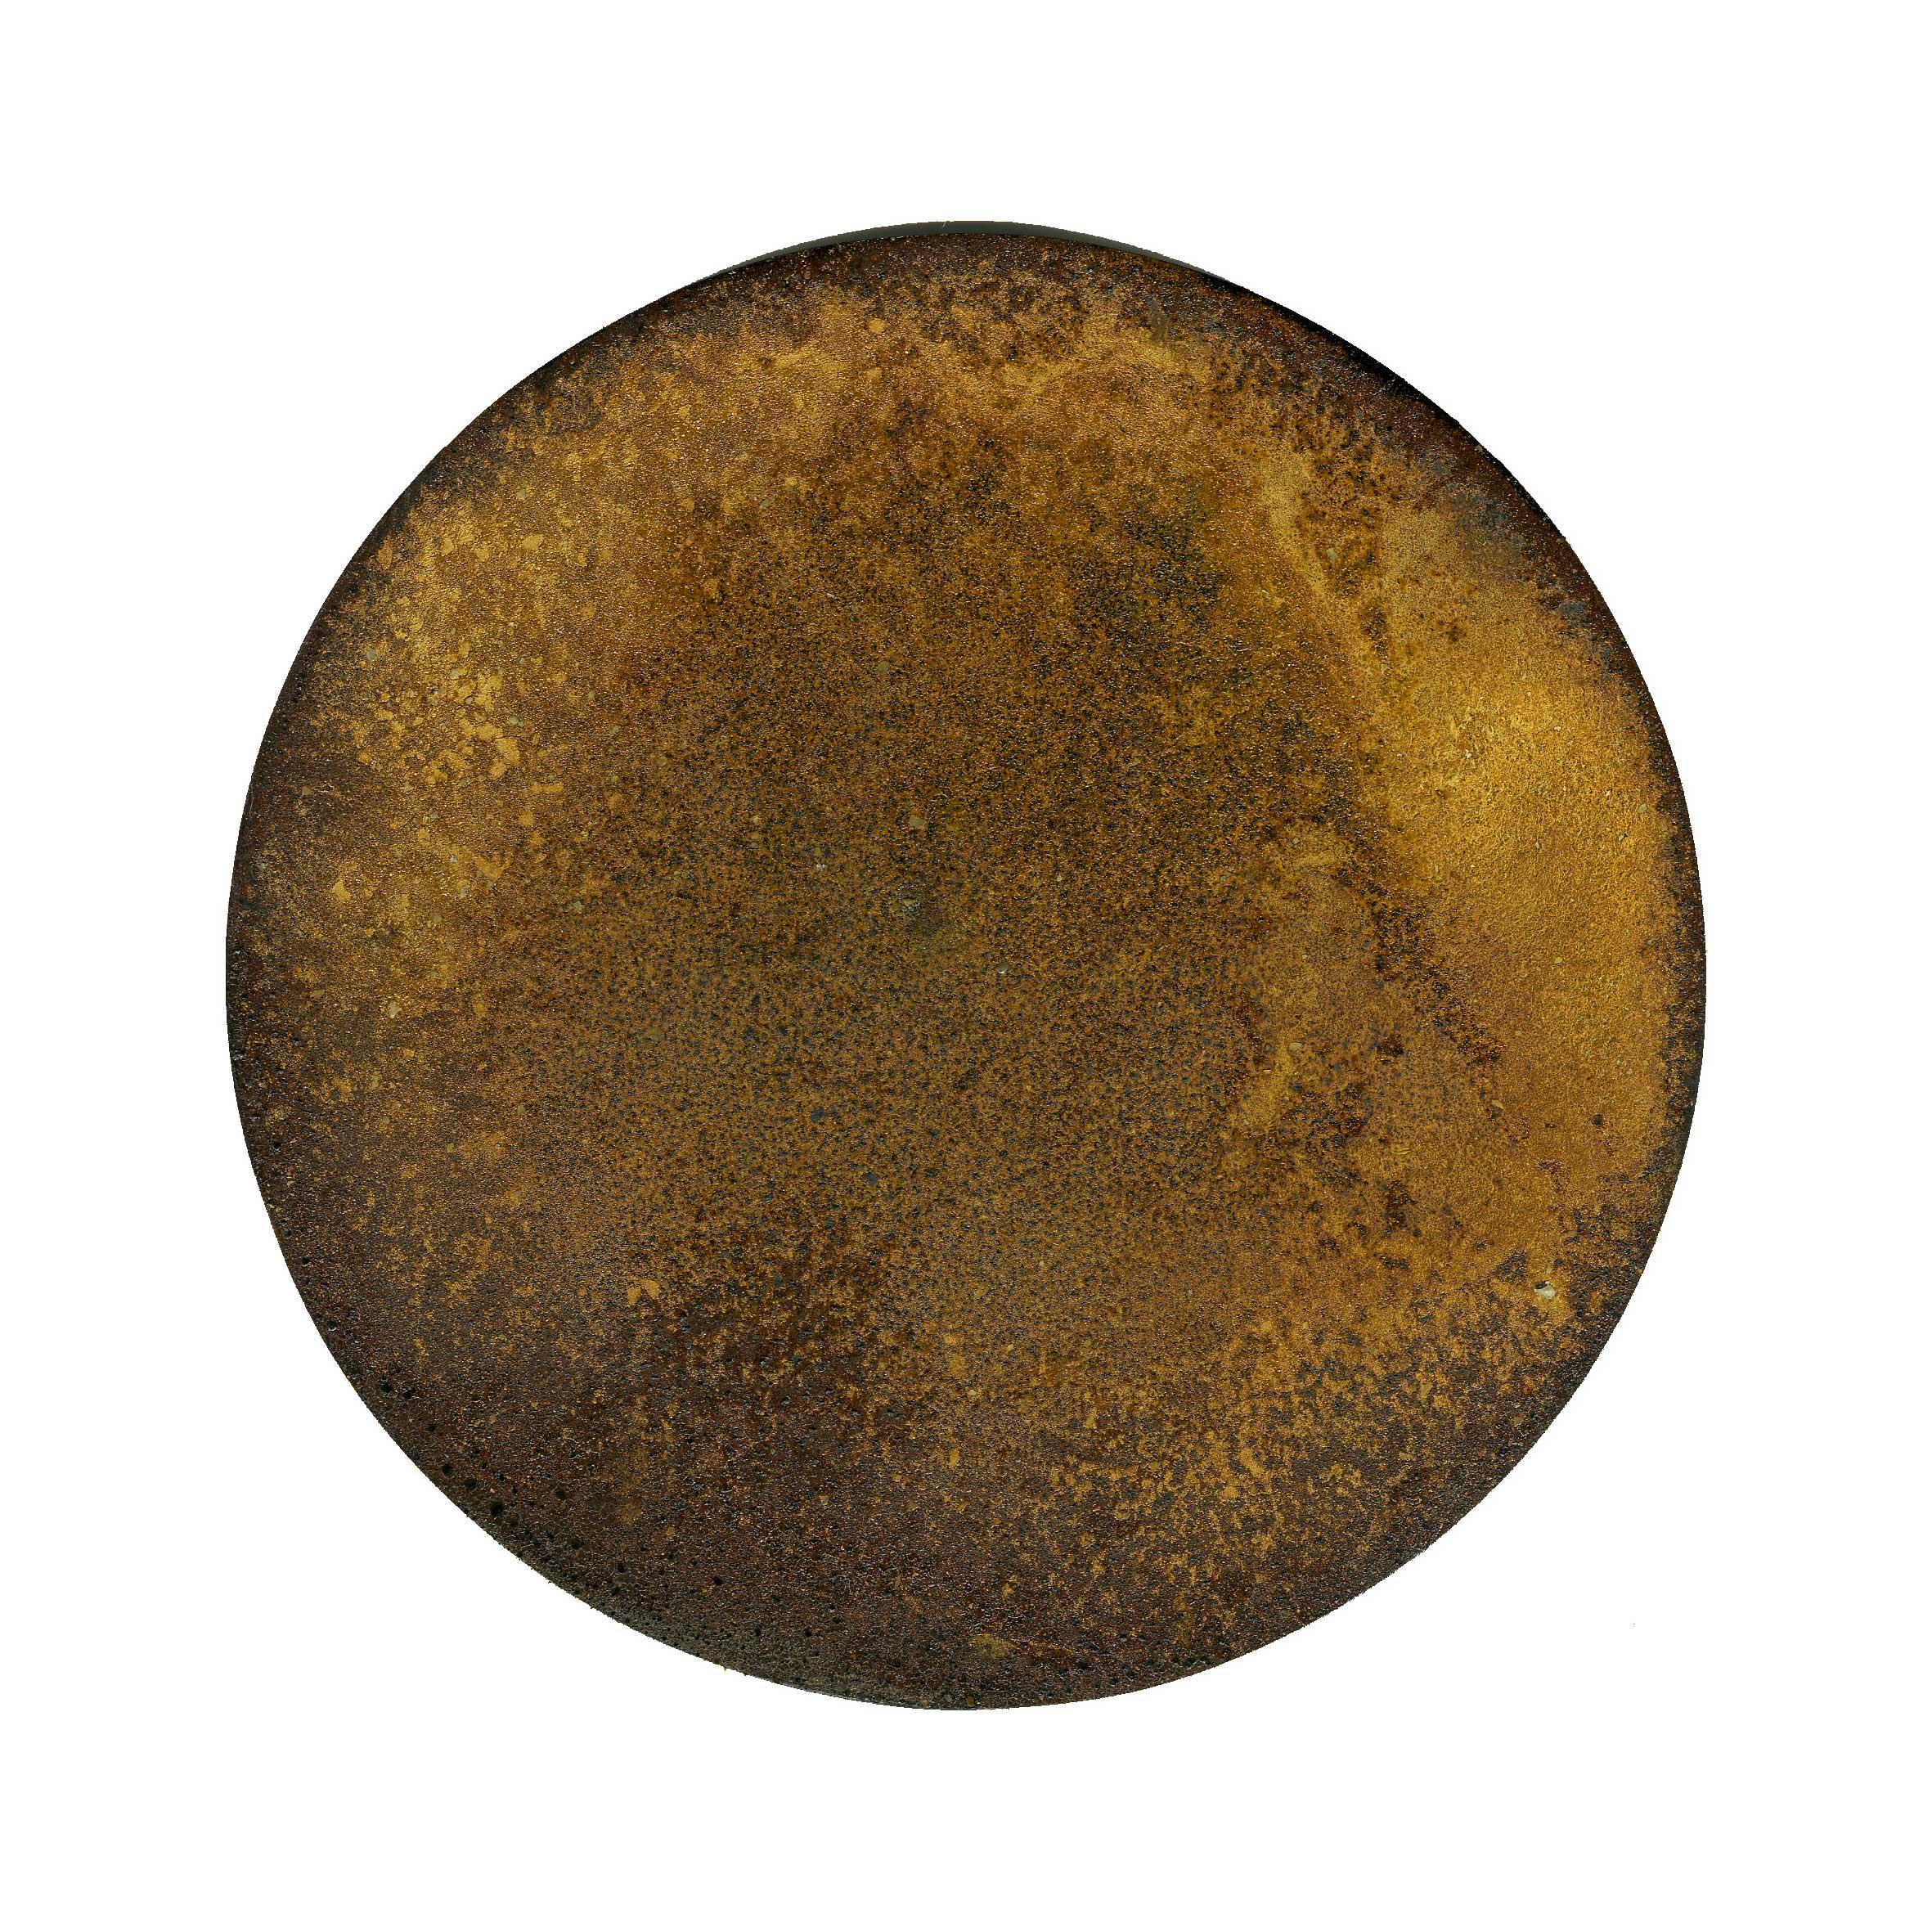 IRON AND TIME (III) 2010  oxidised iron disc  Ø 120 mm